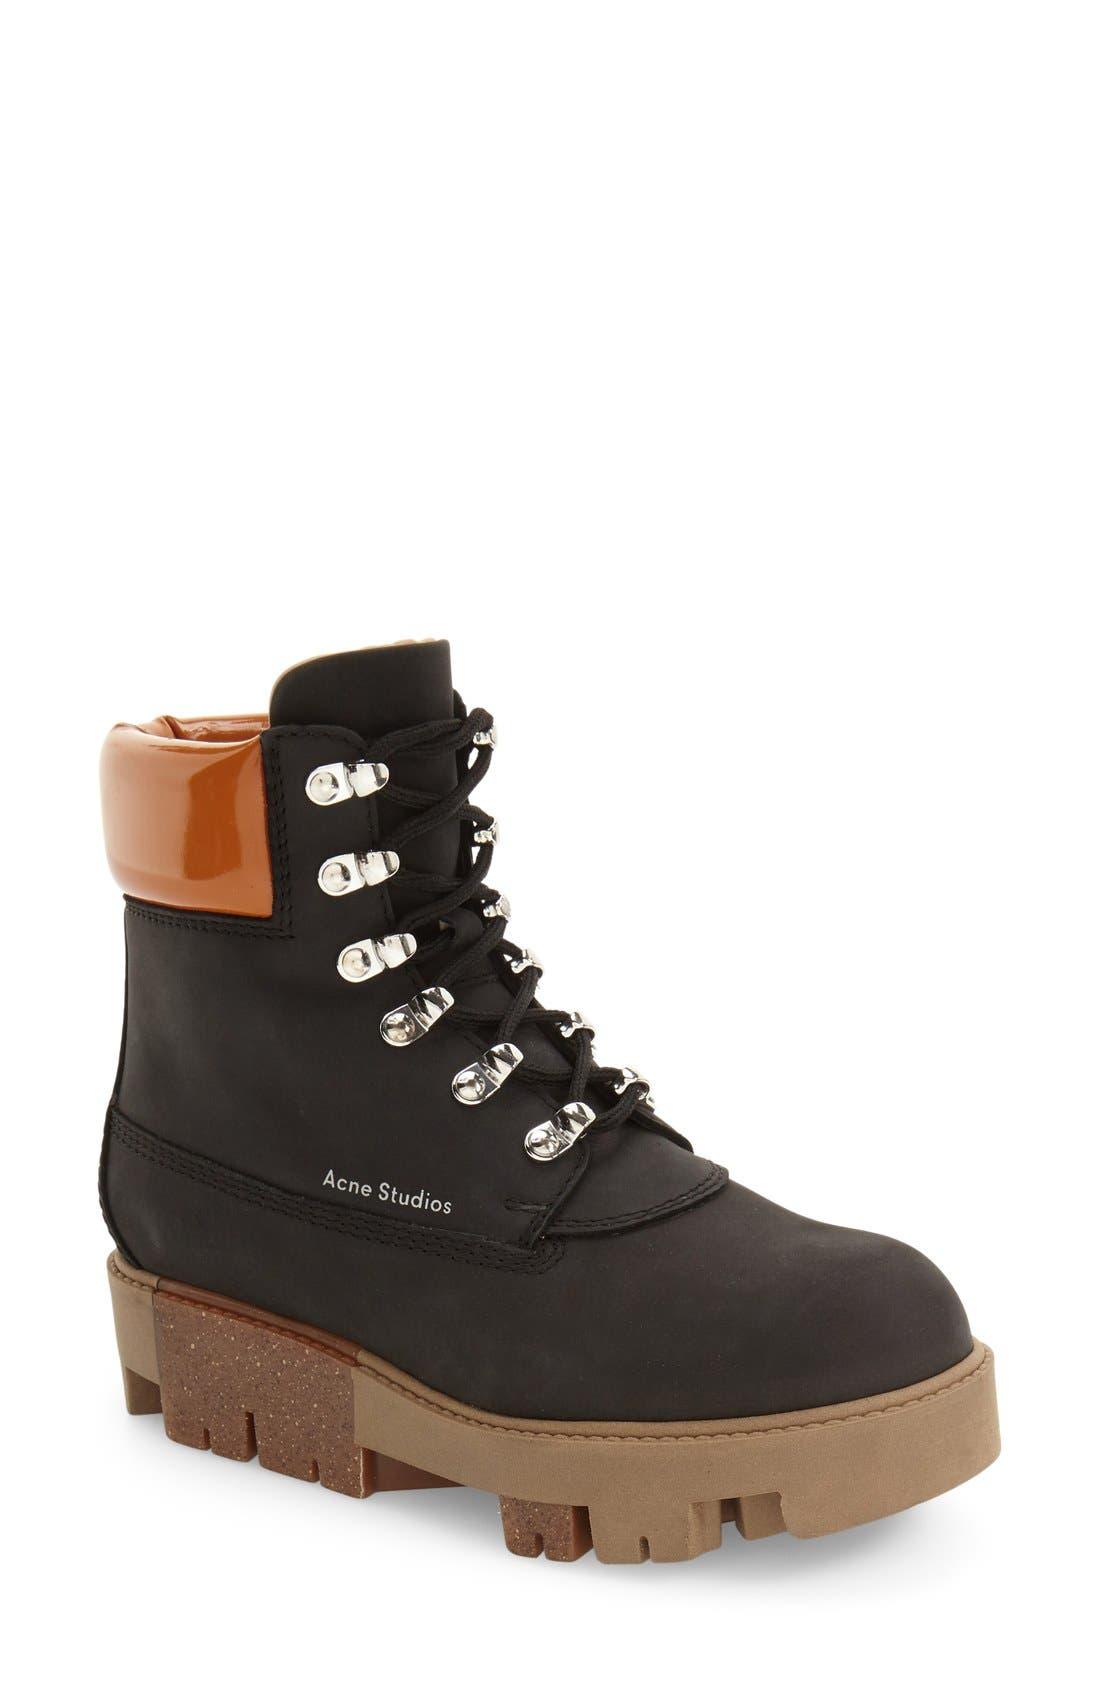 Main Image - ACNE Studios Telda Hiker Boot (Women)